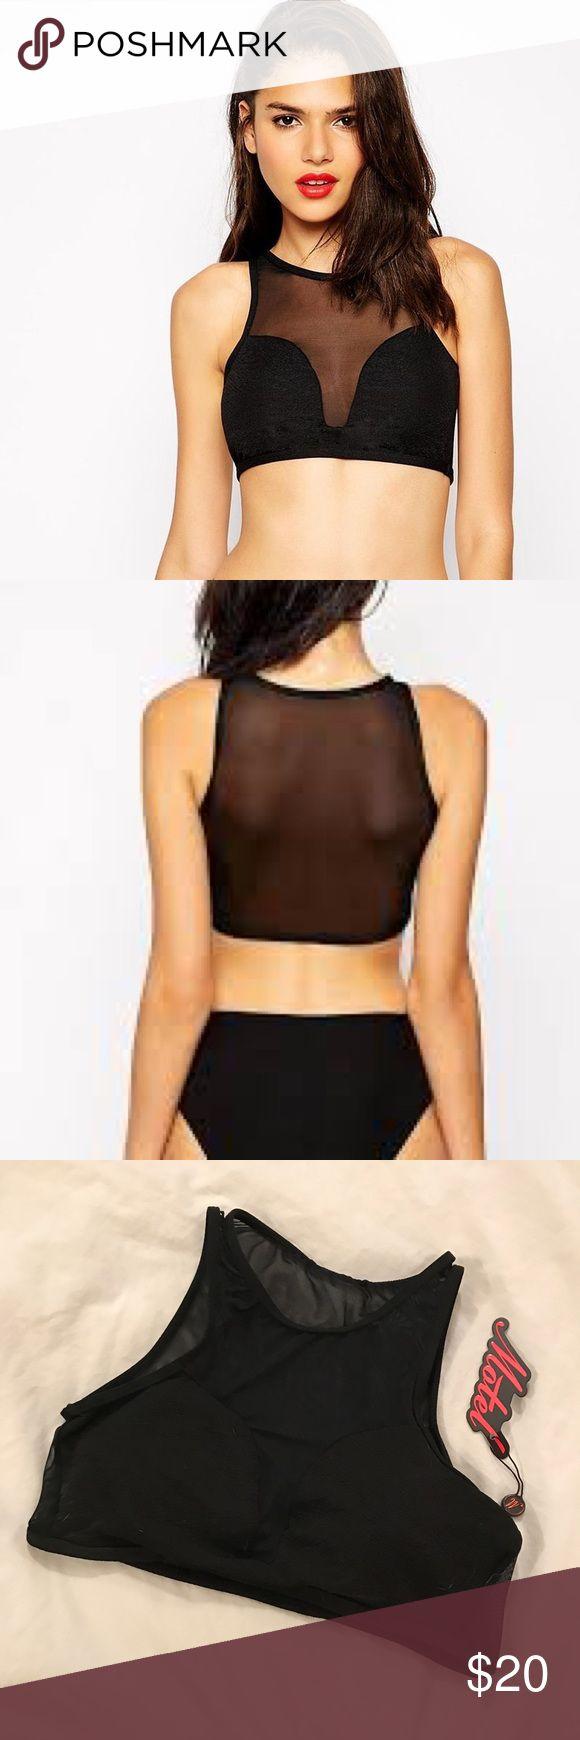 MOTEL Vice Cut Out Bikini Top in Black Textured M Super sexy crop bikini top! NWT. Motel Rocks Swim Bikinis